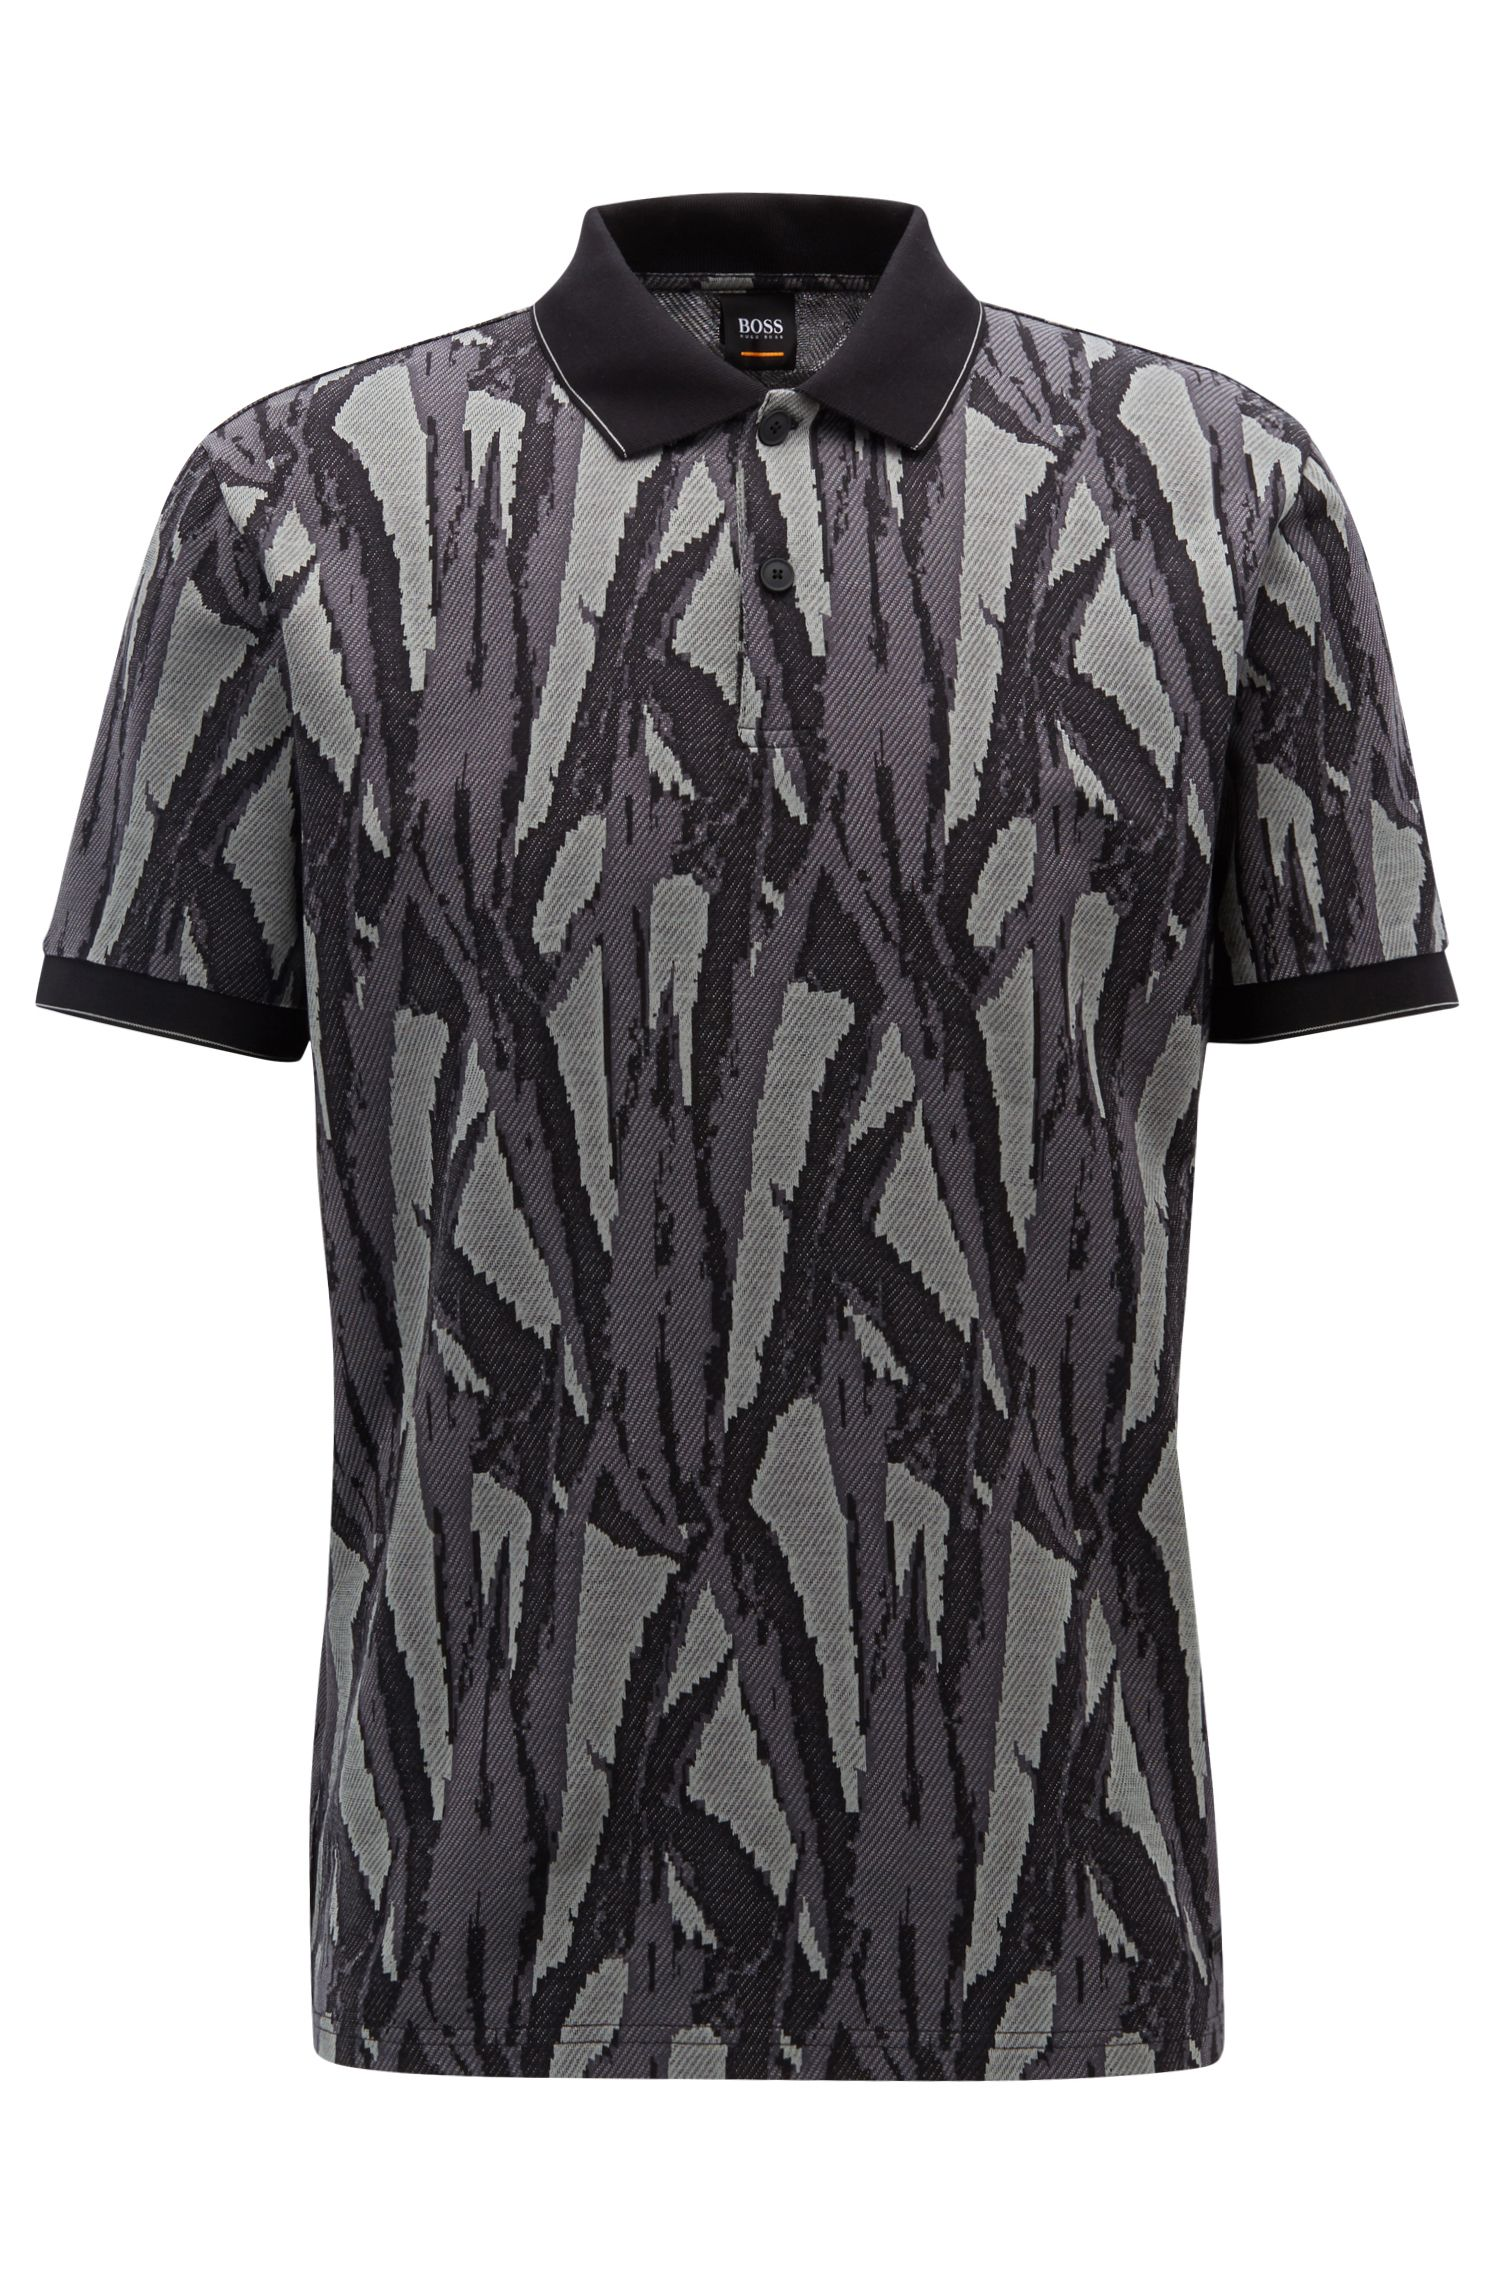 Poloshirt aus Baumwolle mit Jacquard-Muster aus der Kollektion, Dunkelgrün